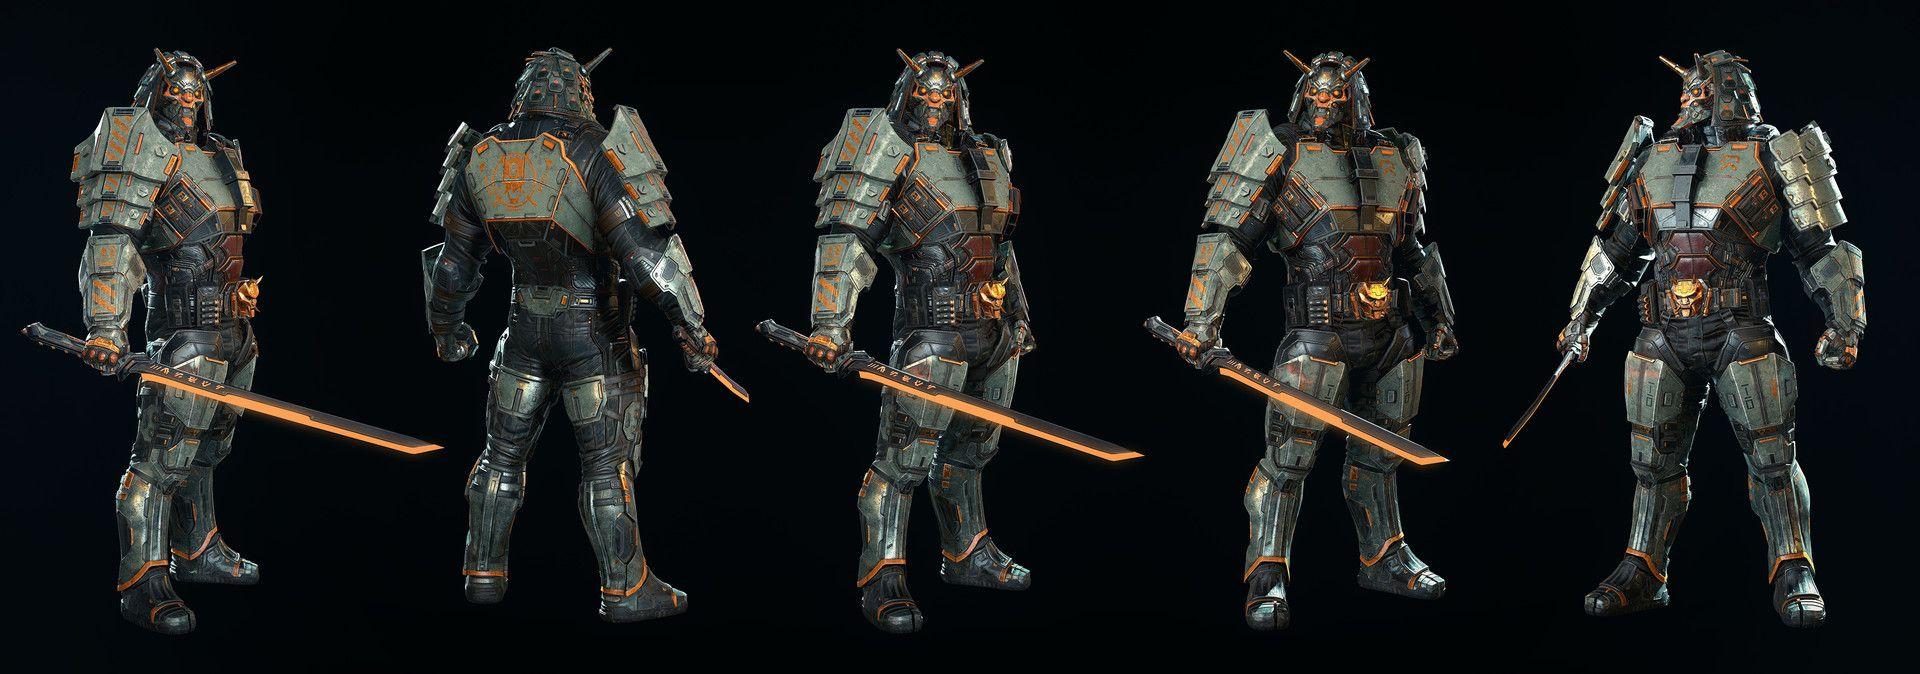 Artstation Ronen Alternate Modern Combat Versus Gameloft Rodrigue Pralier Sci Fi Concept Art Ronen Robots Concept